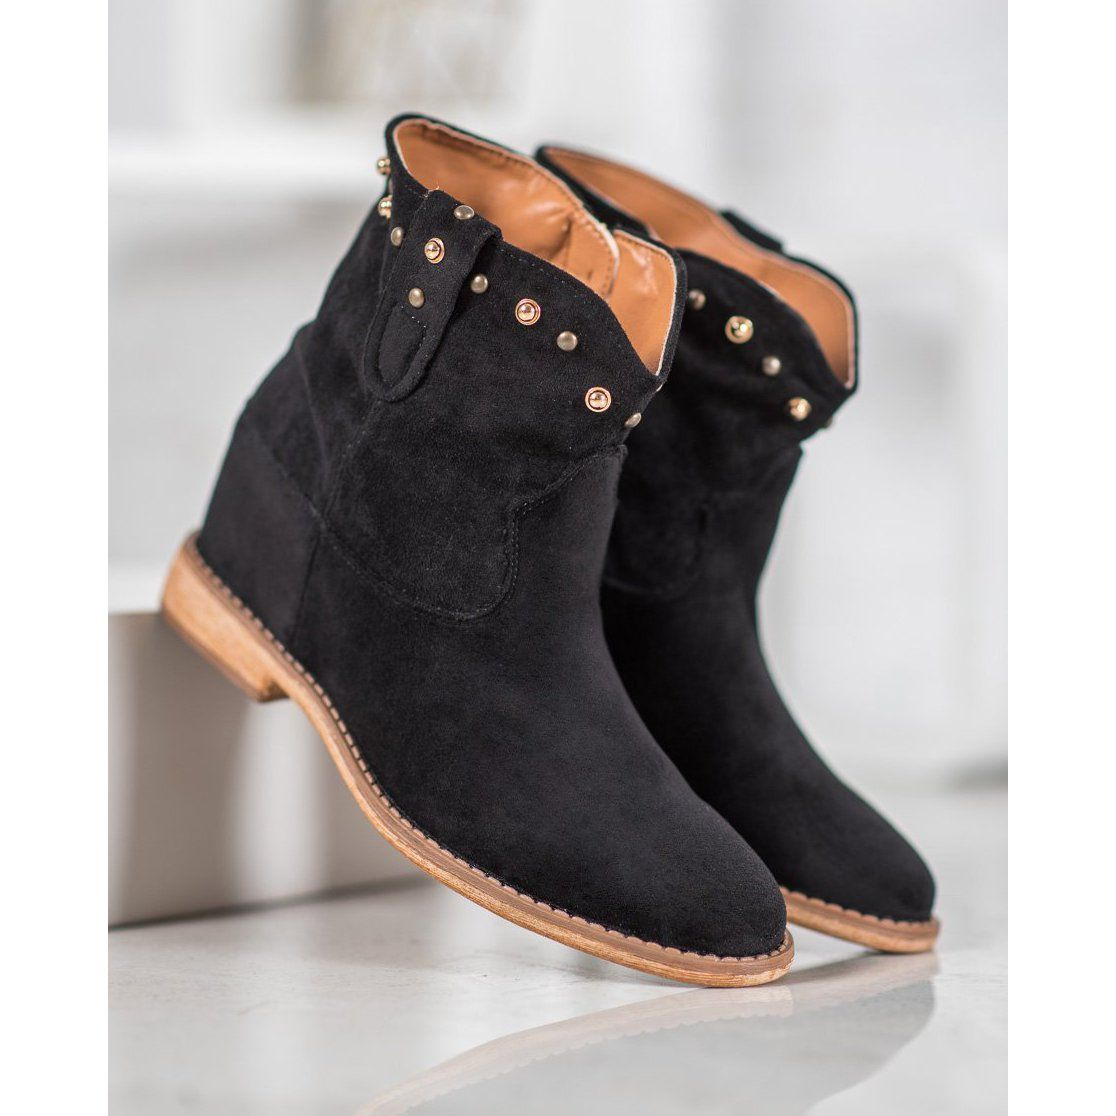 Bella Paris Zamszowe Kowbojki Z Dzetami Czarne Black Boots Women Boots Suede Cowboy Boots